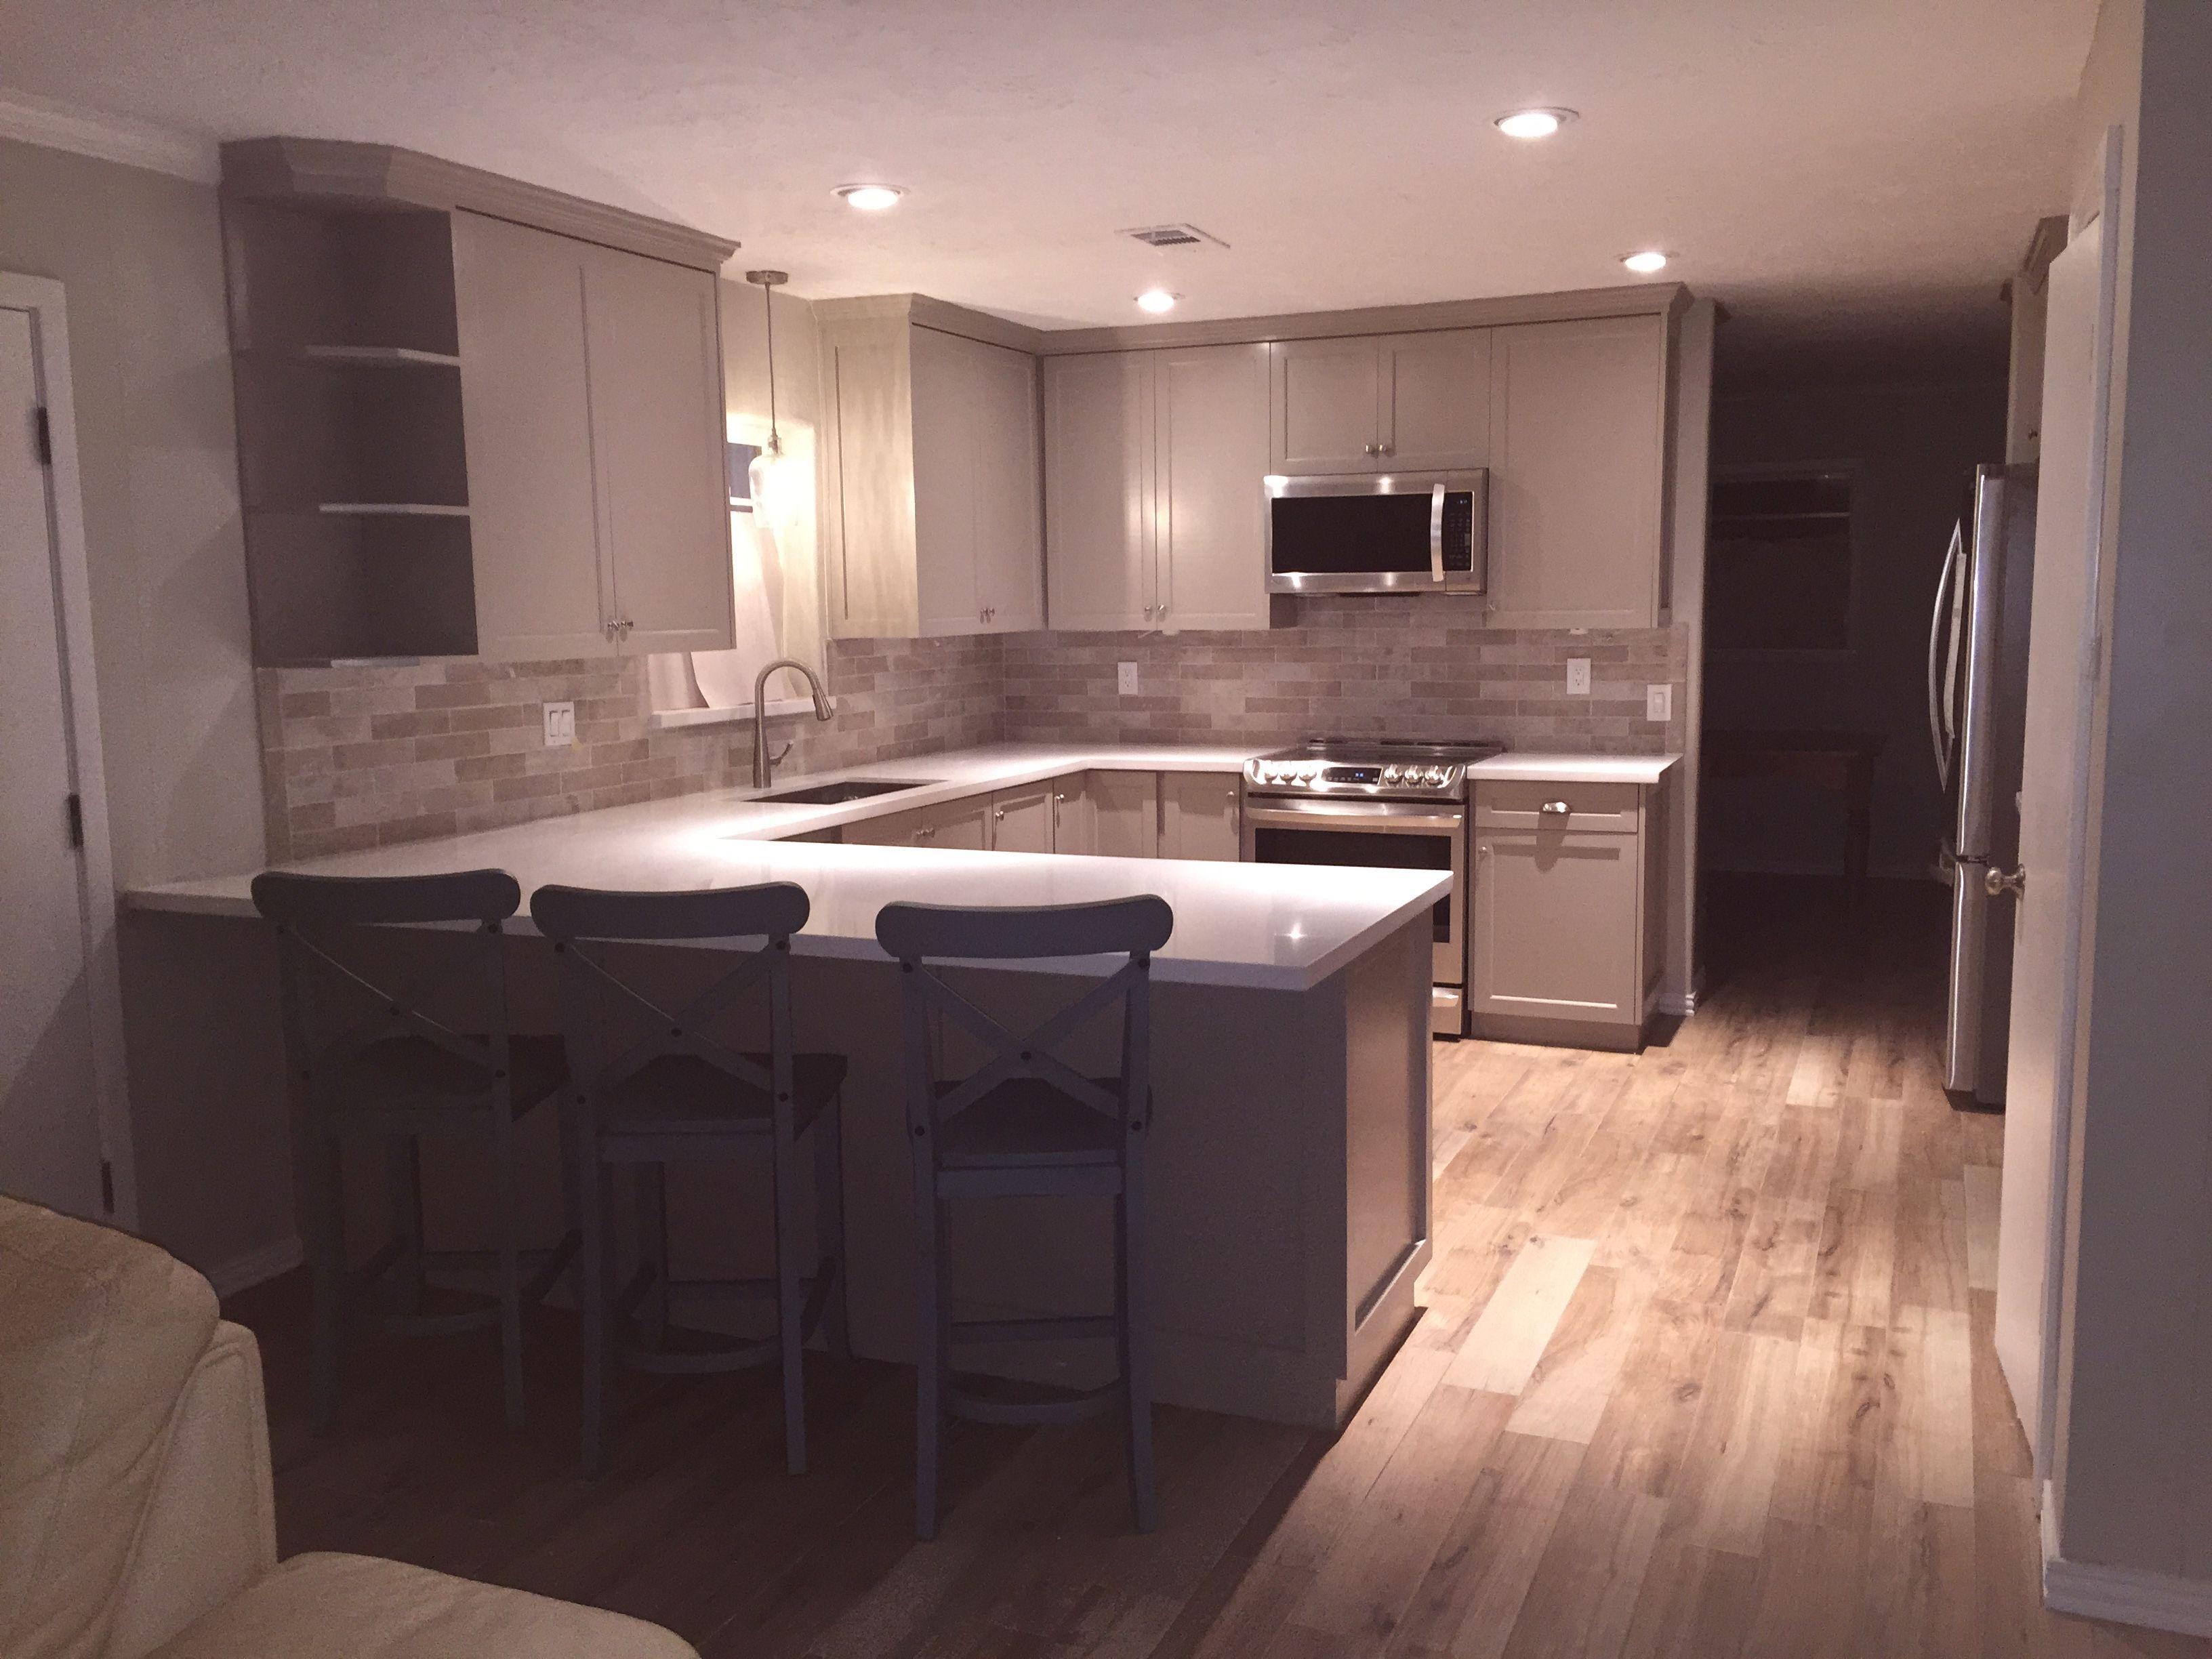 Mega Greige Kitchen With Wood Look Tile Floors Wood Look Tile Floor Greige Kitchen Wood Look Tile